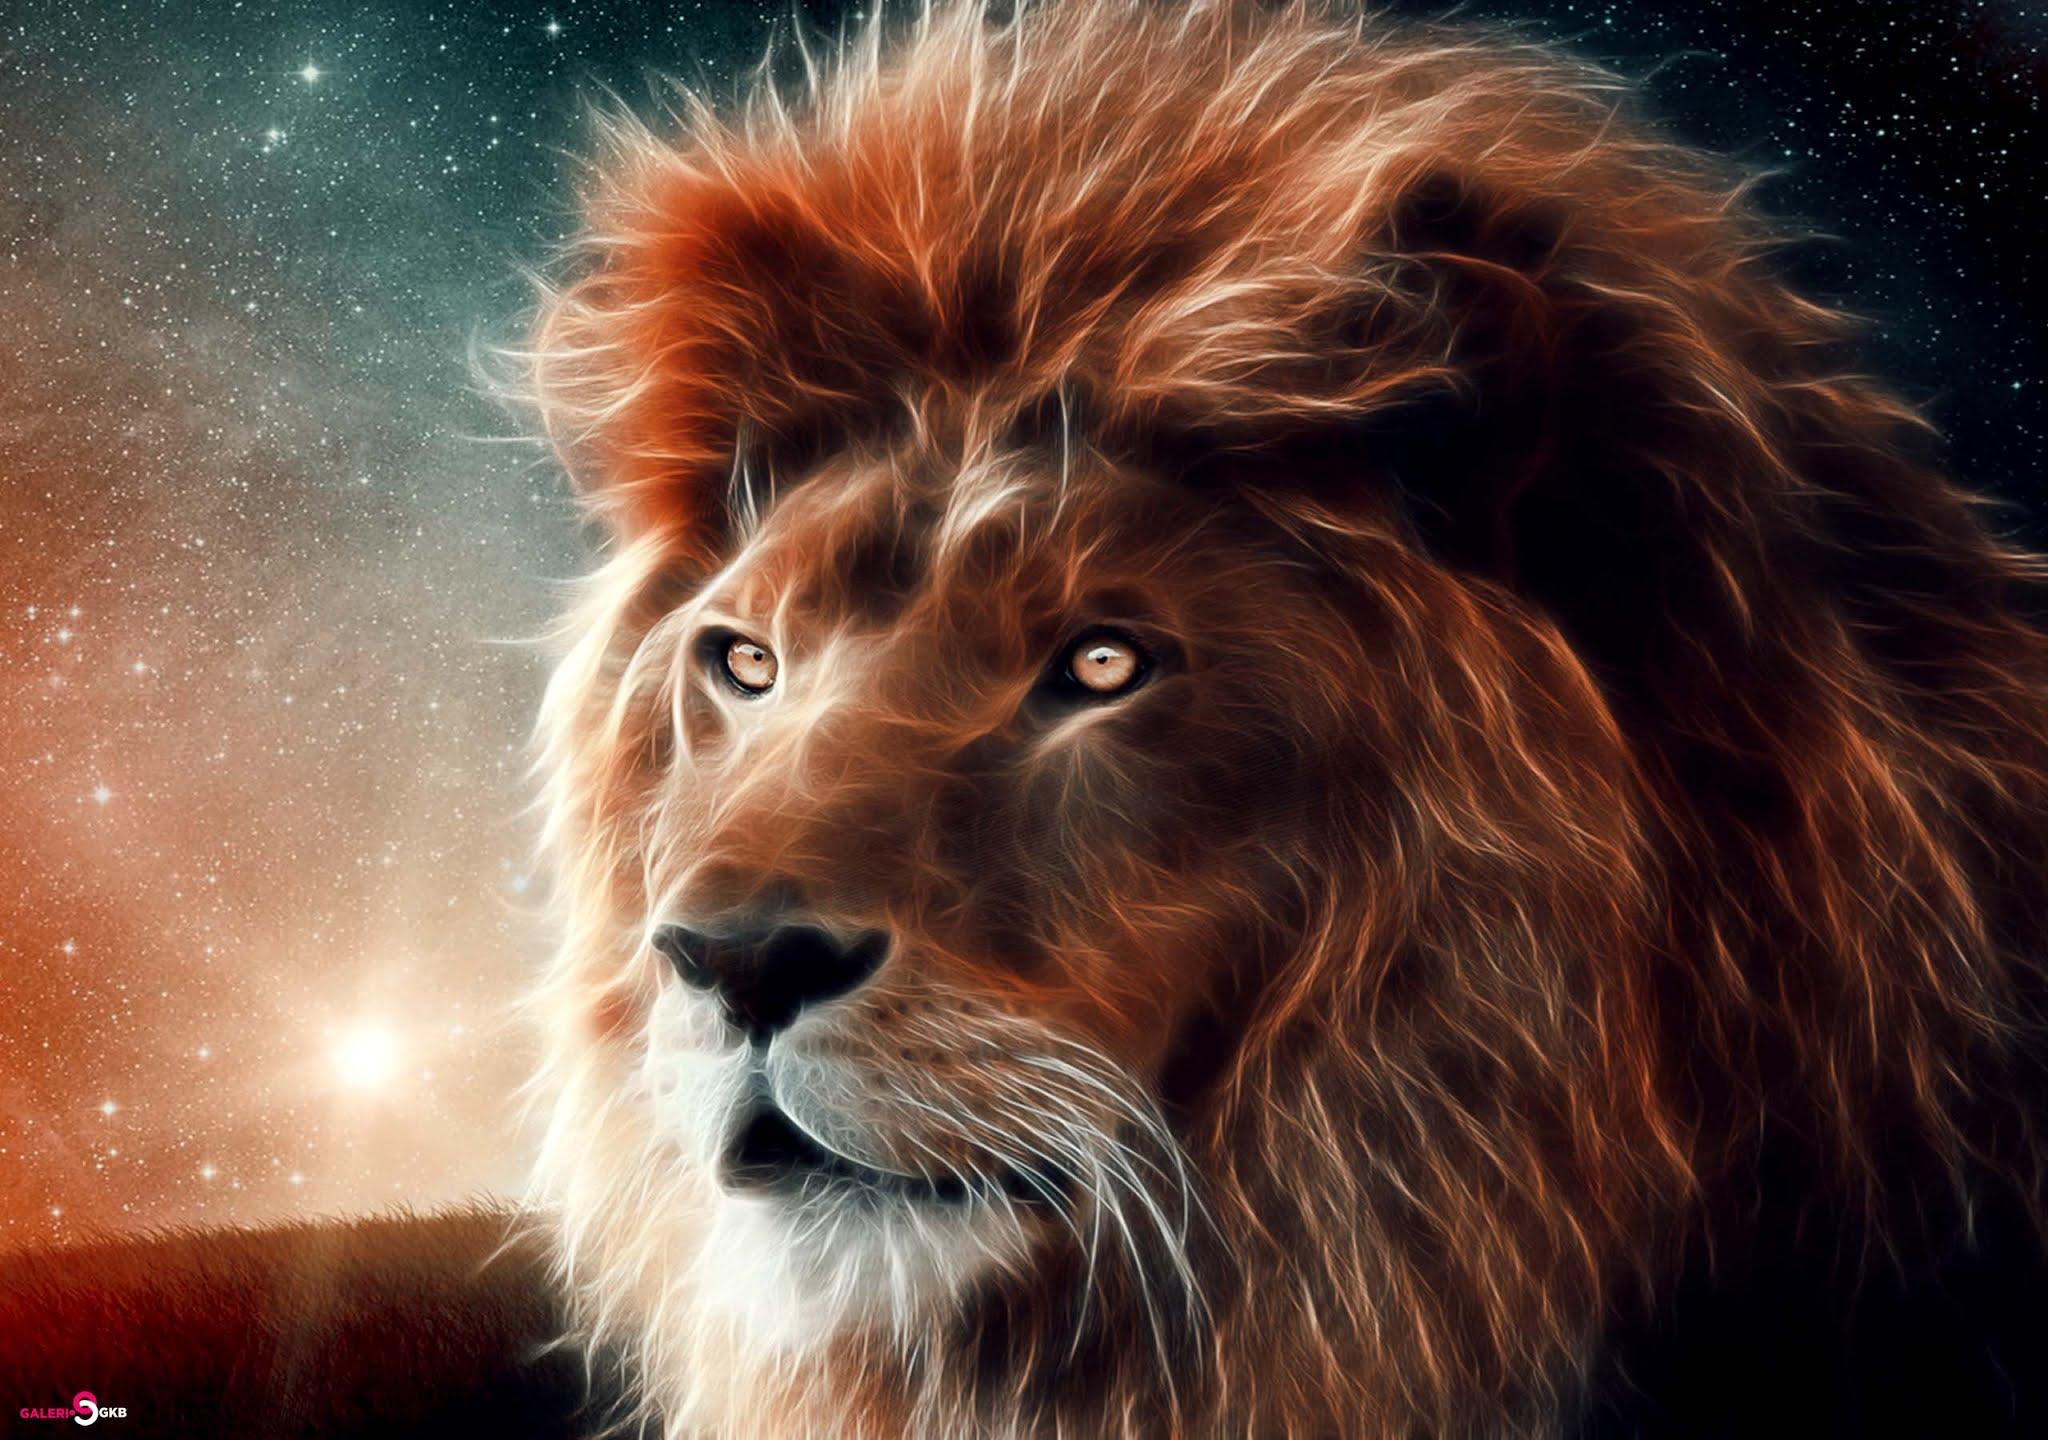 14 Lion Ultra HD Wallpaper For Computers Desktop, Lion Background Image PC